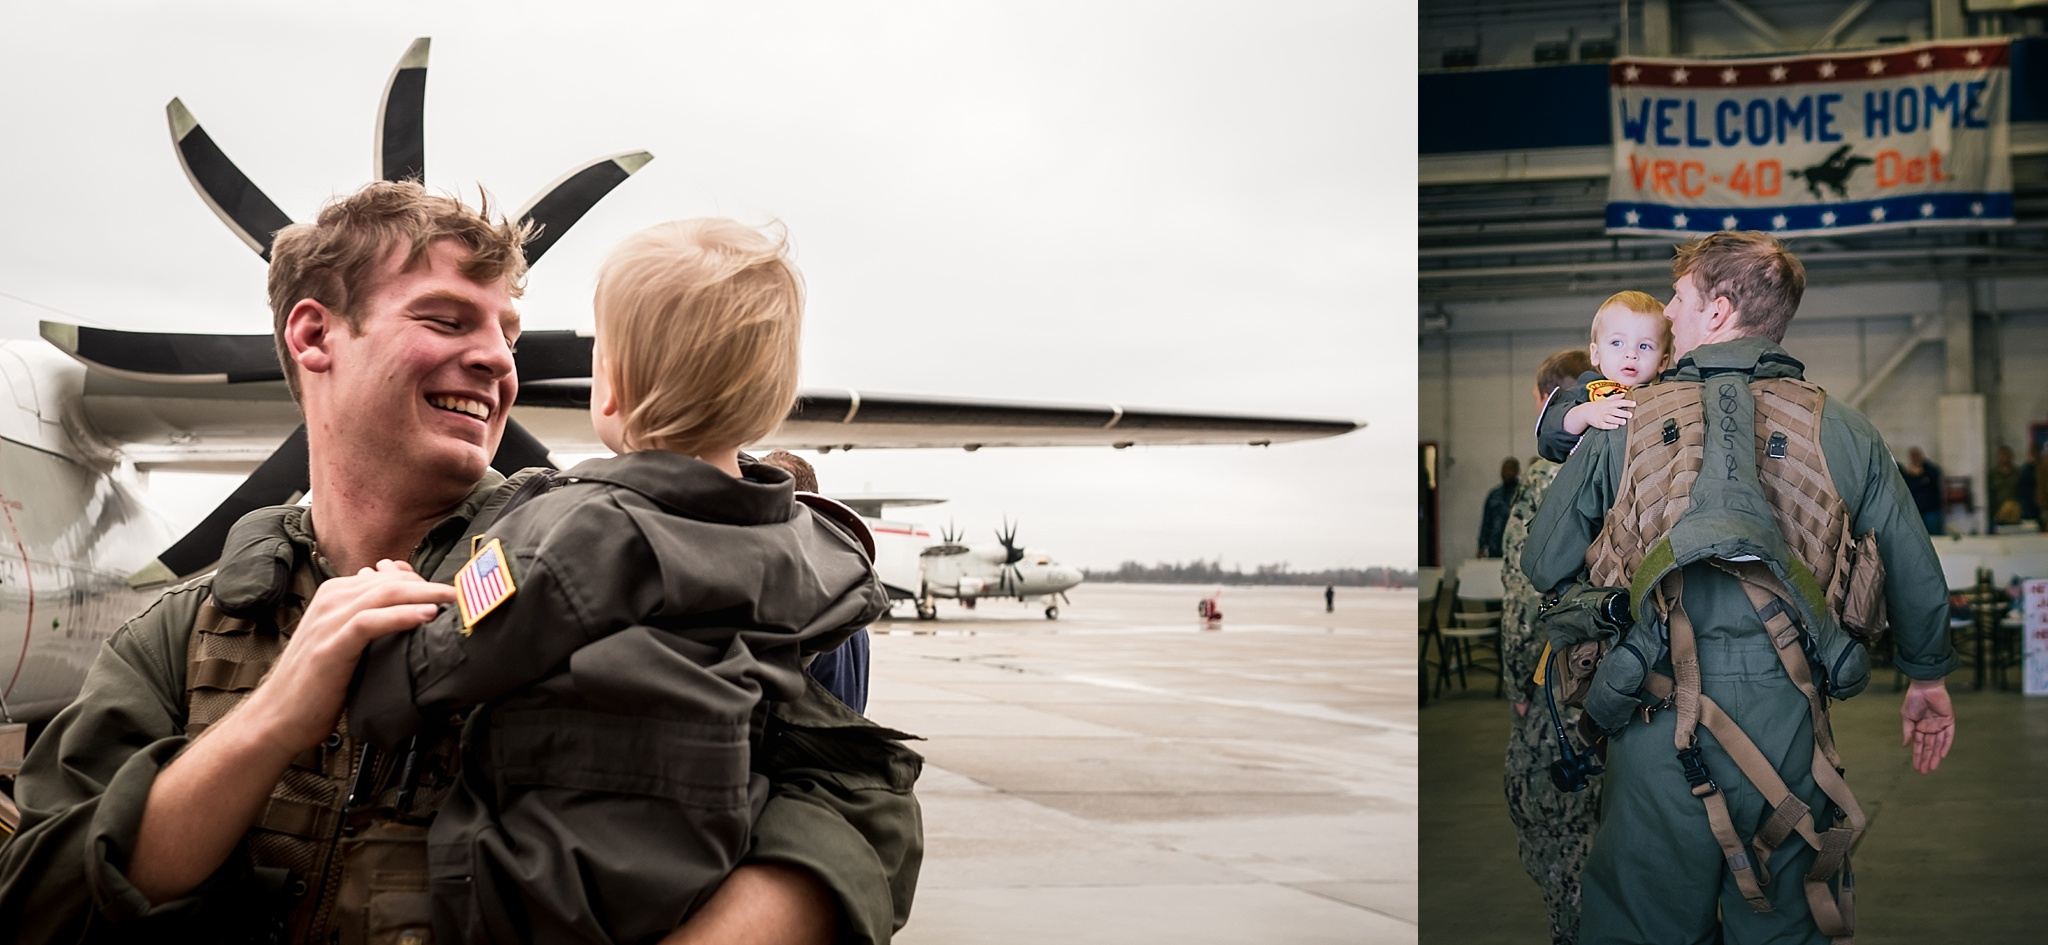 pilot_military_homecoming.jpg